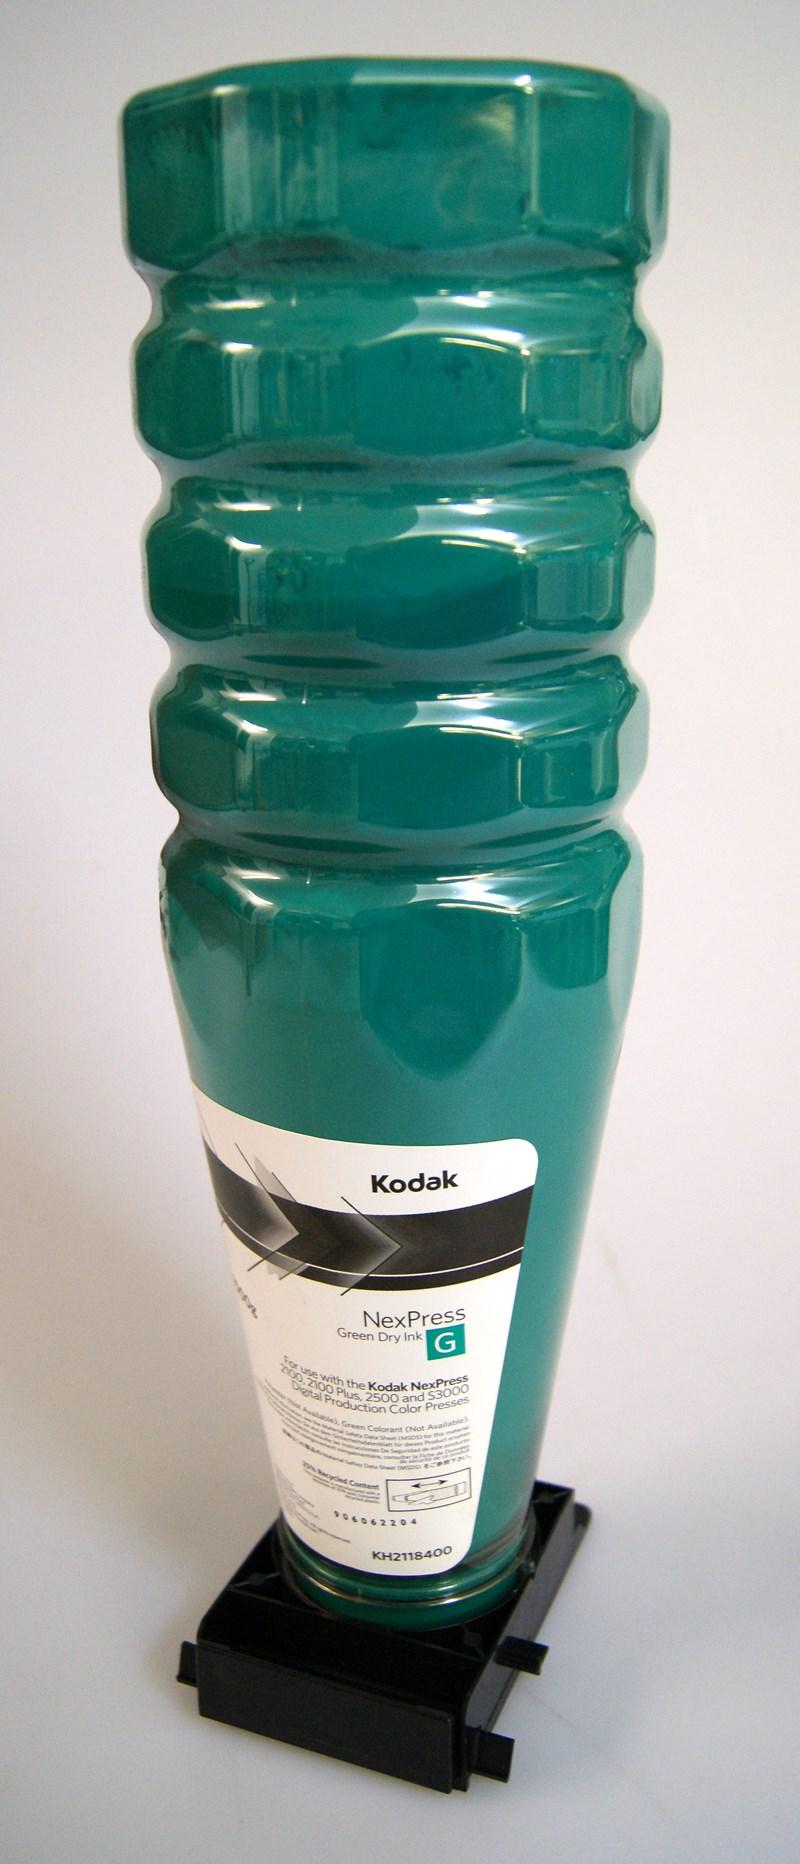 Kodak NexPress Green Dry Ink G